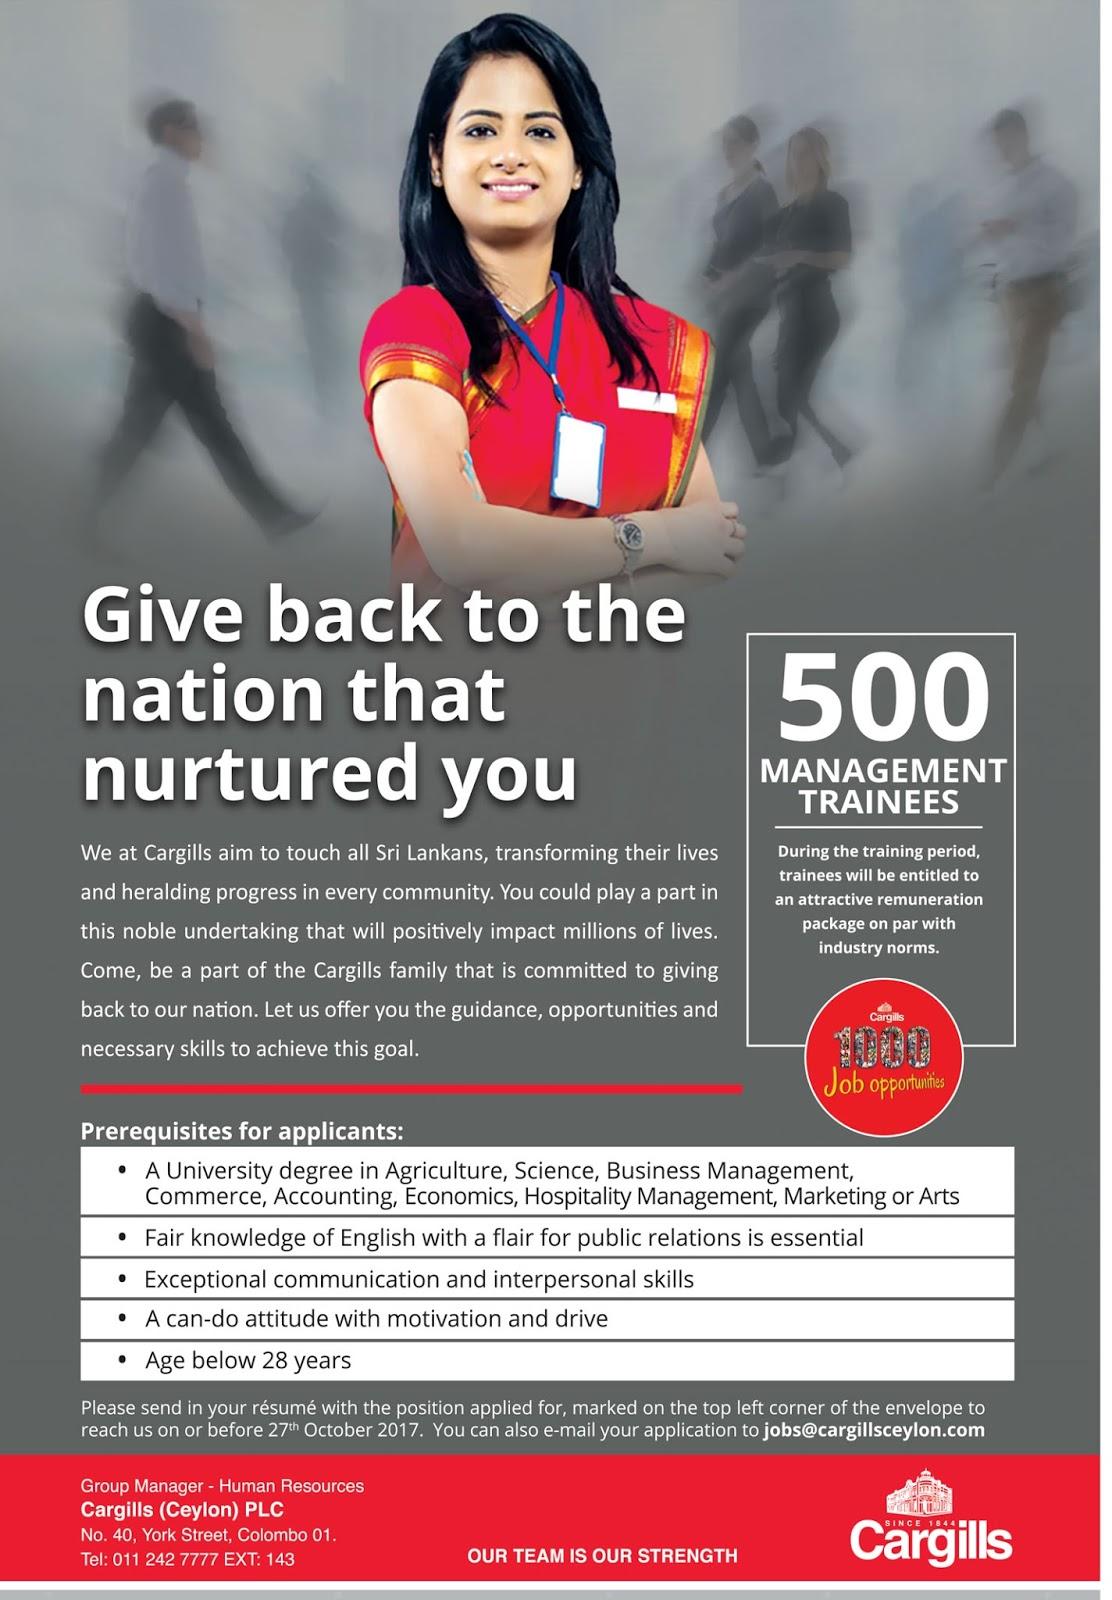 Management Trainees - Cargills (Ceylon) PLC Vacancies